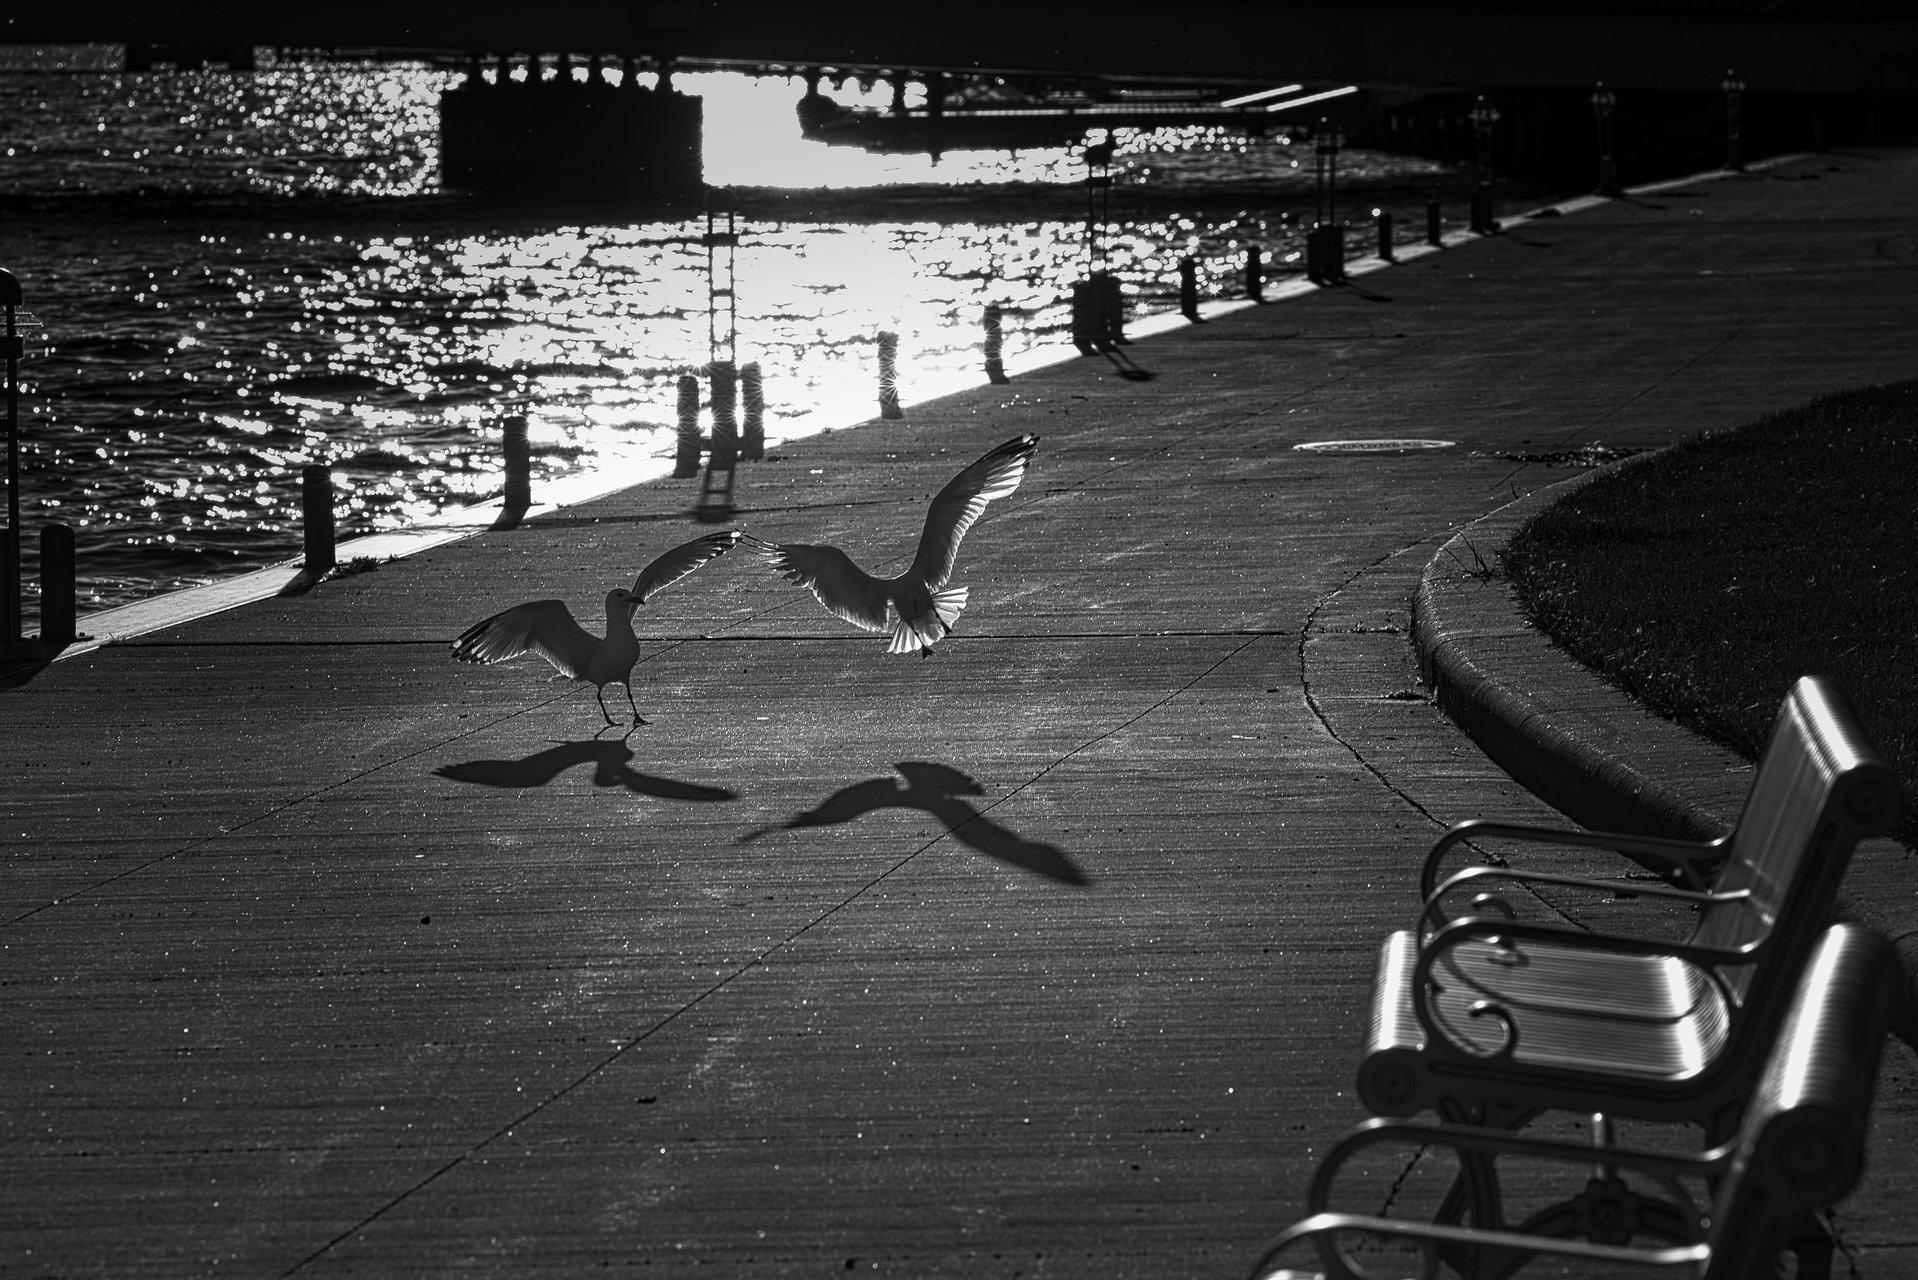 Игра | Author Nikolay Popov - NIK | PHOTO FORUM